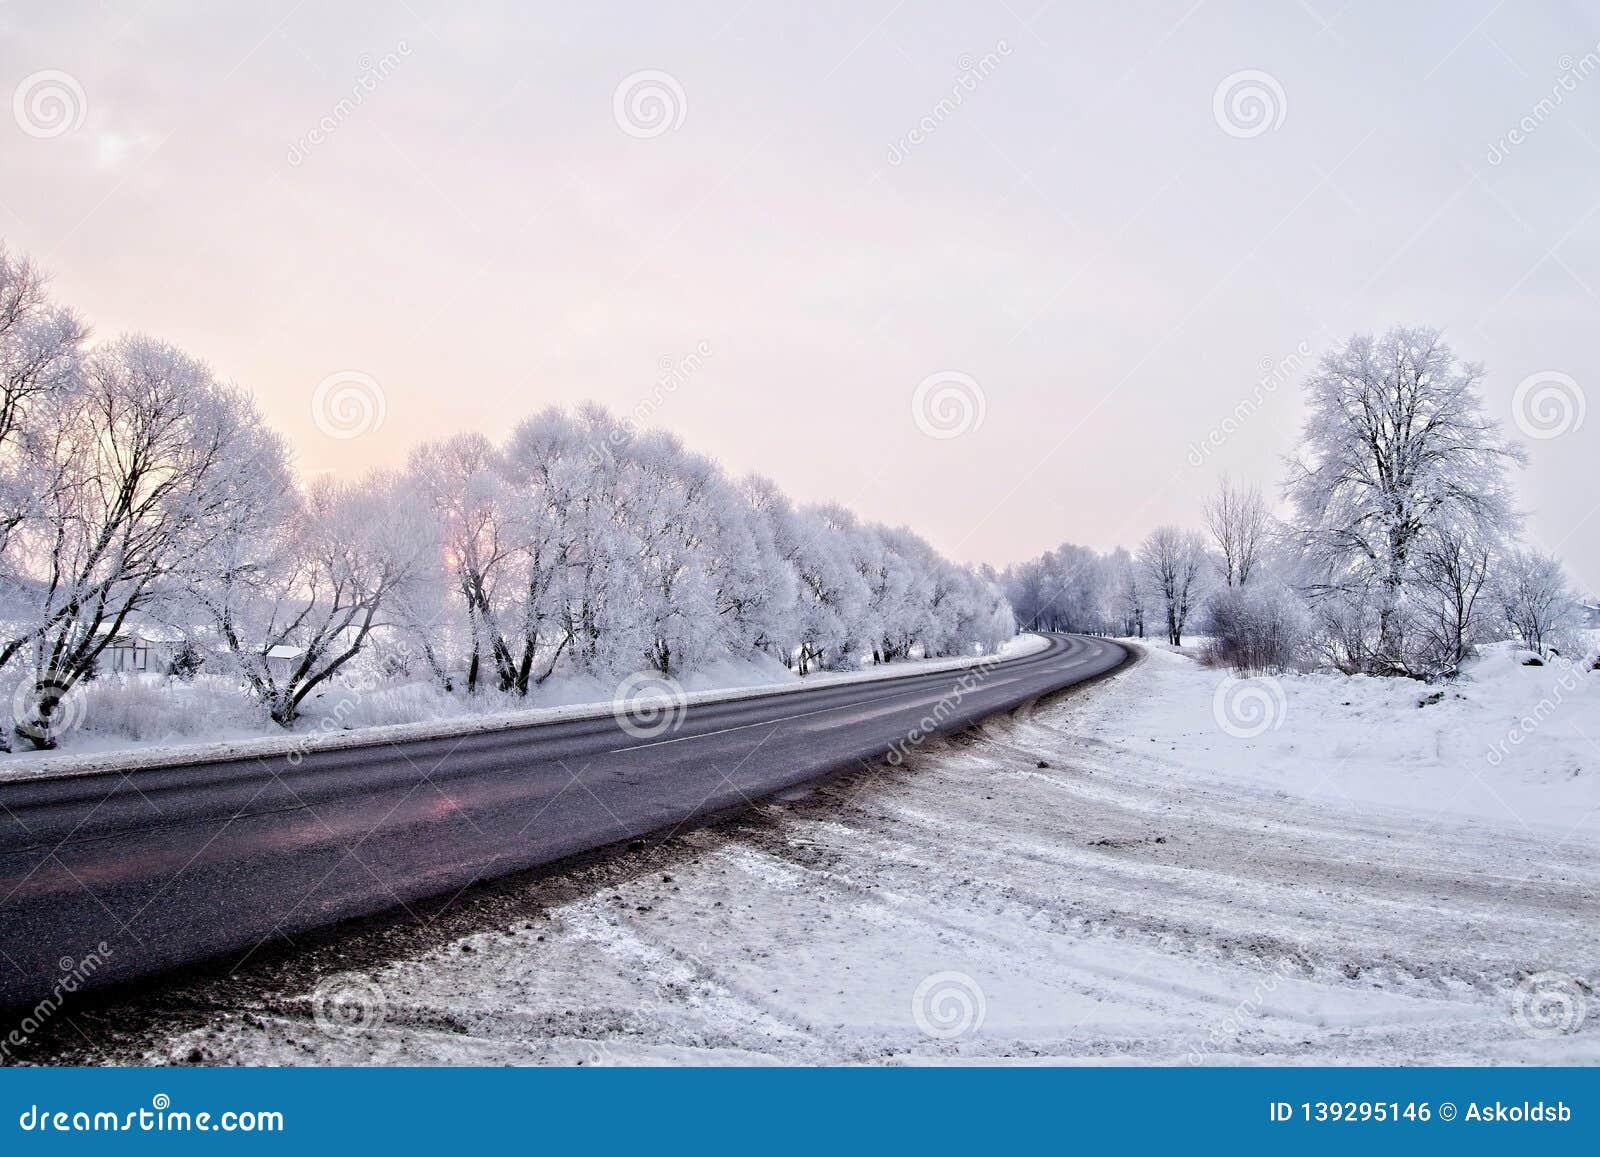 33c 1月横向俄国温度ural冬天 在早期的涂柏油的农村路,寒冷冬天日出-图象